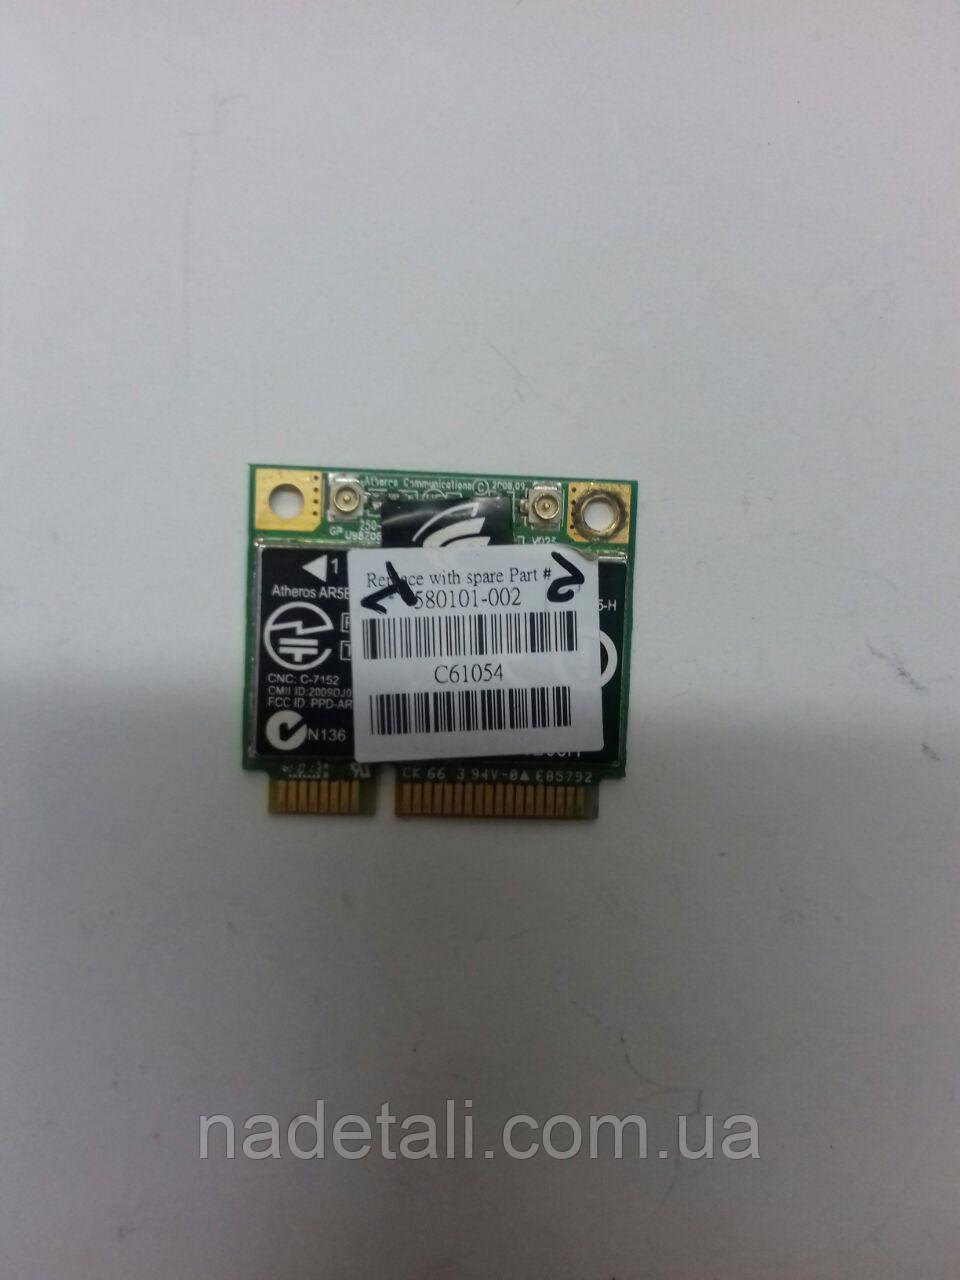 Wi-Fi модуль HP 630 635 Atheros AR5B95-H 580101-002